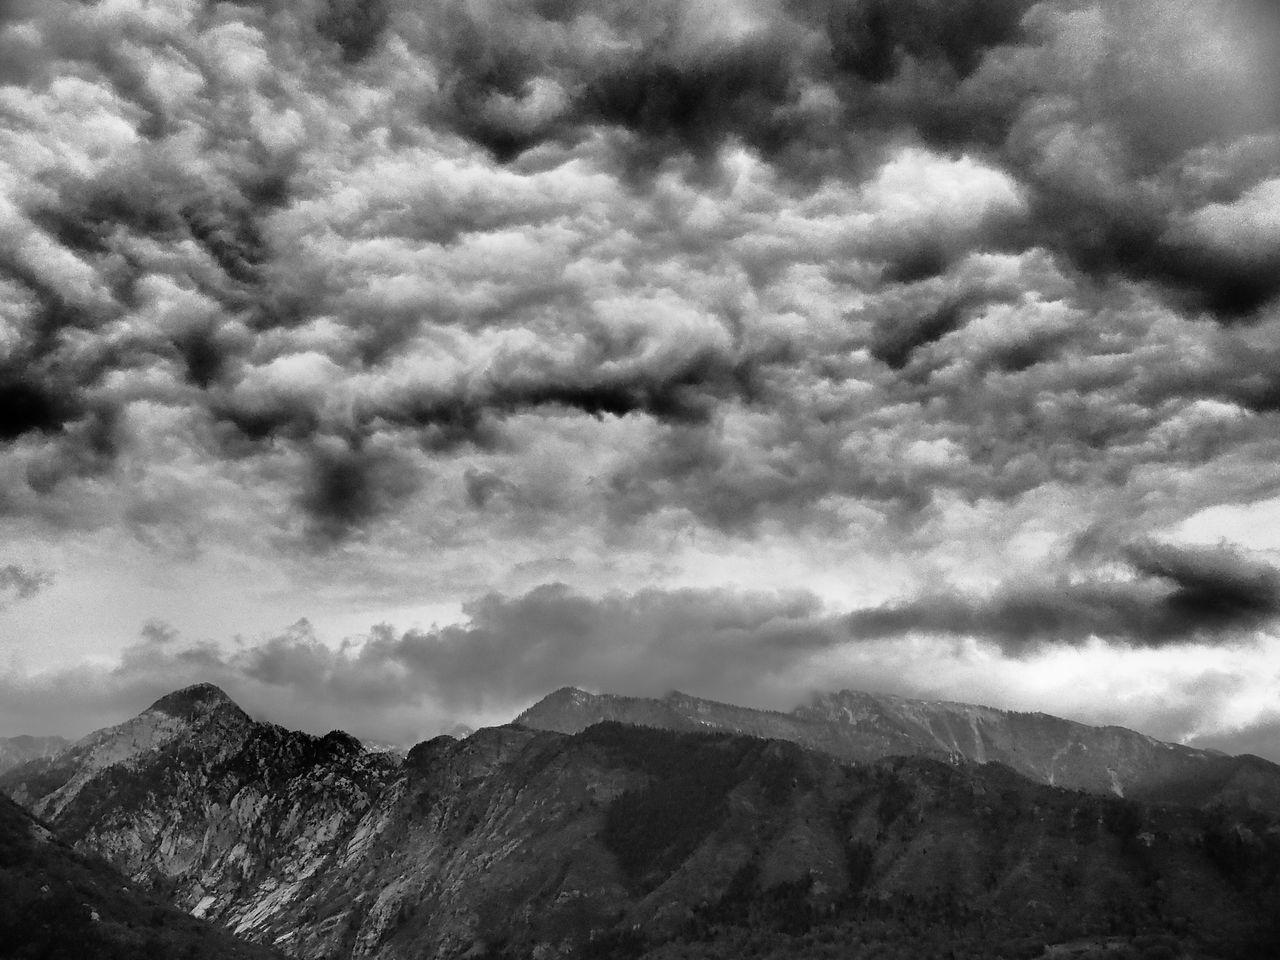 Playing with the filters. Olympus OlympusPEN Rain Rainy Days Filter Mountains Mountain View Mountain_collection Black And White Black&white Blackandwhitephotography Littlecottonwoodcanyon Utah